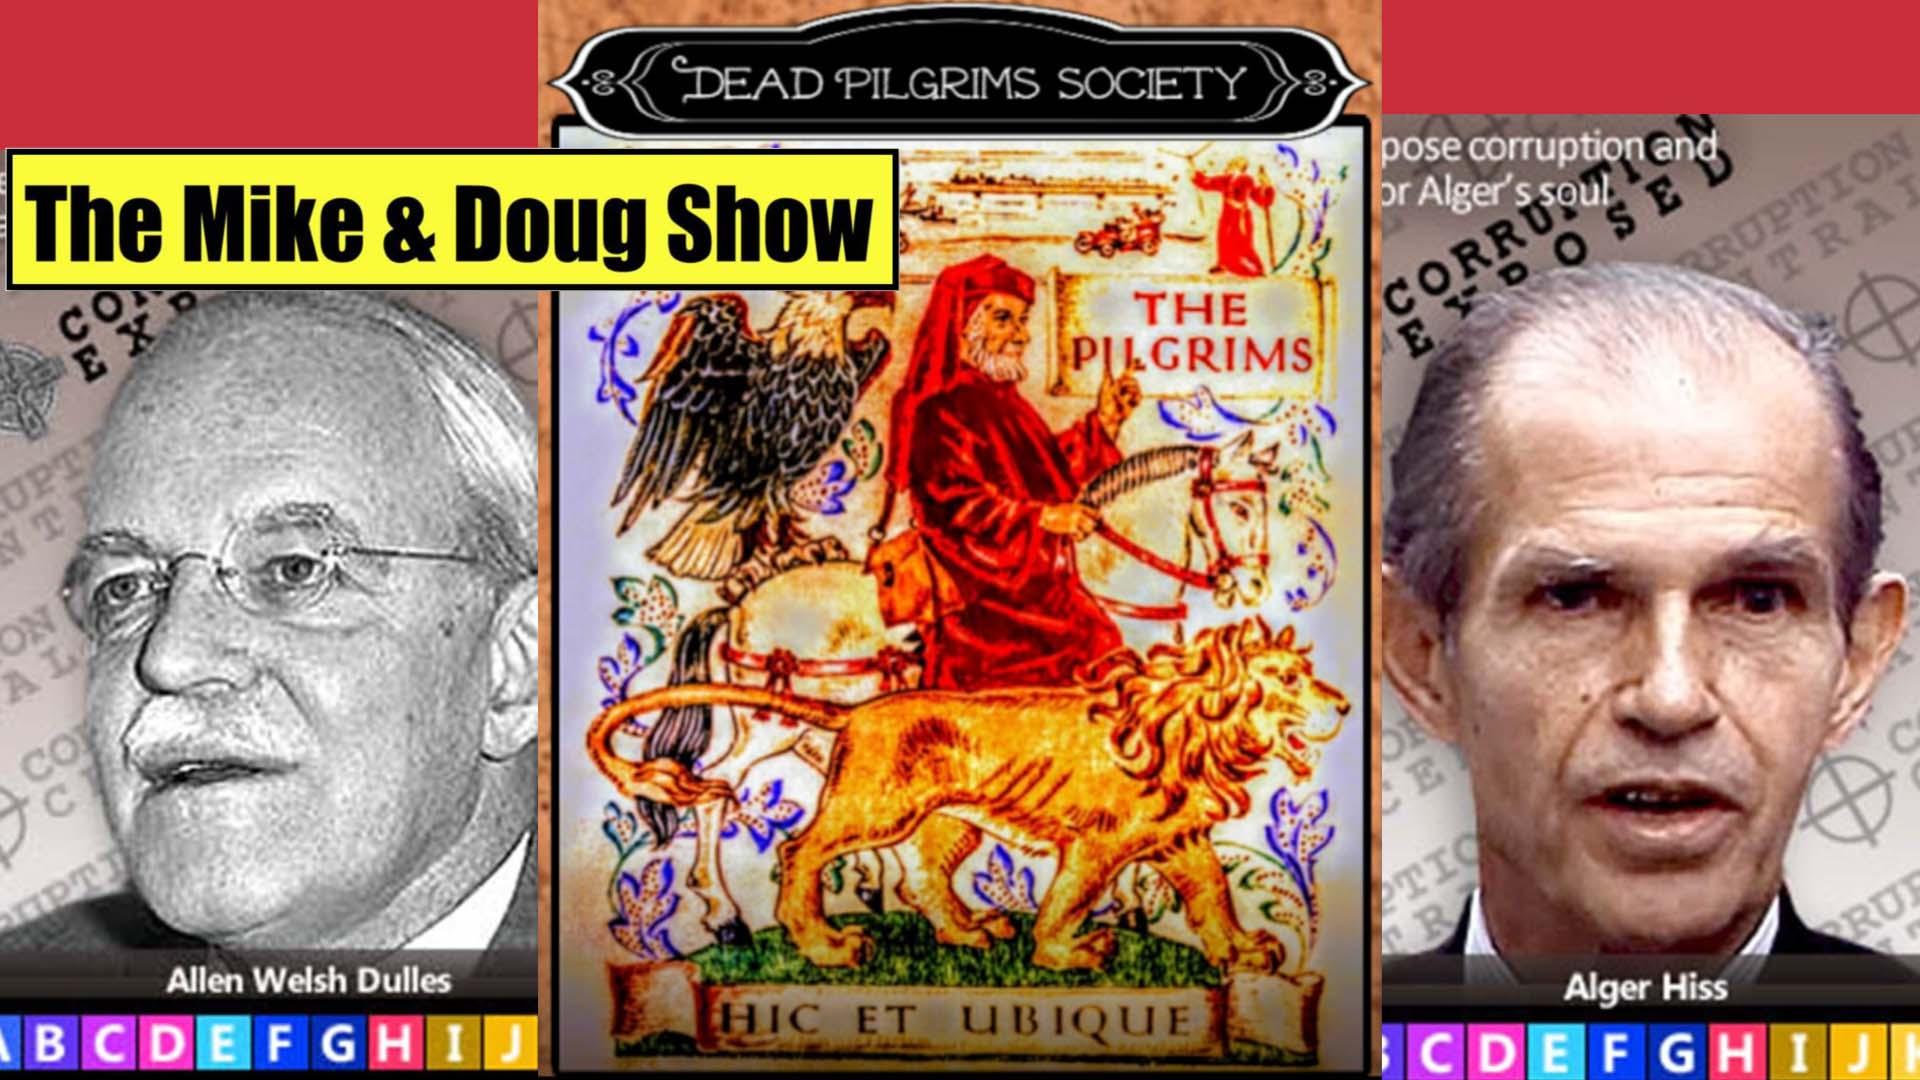 dead pilgrims society thumbnail